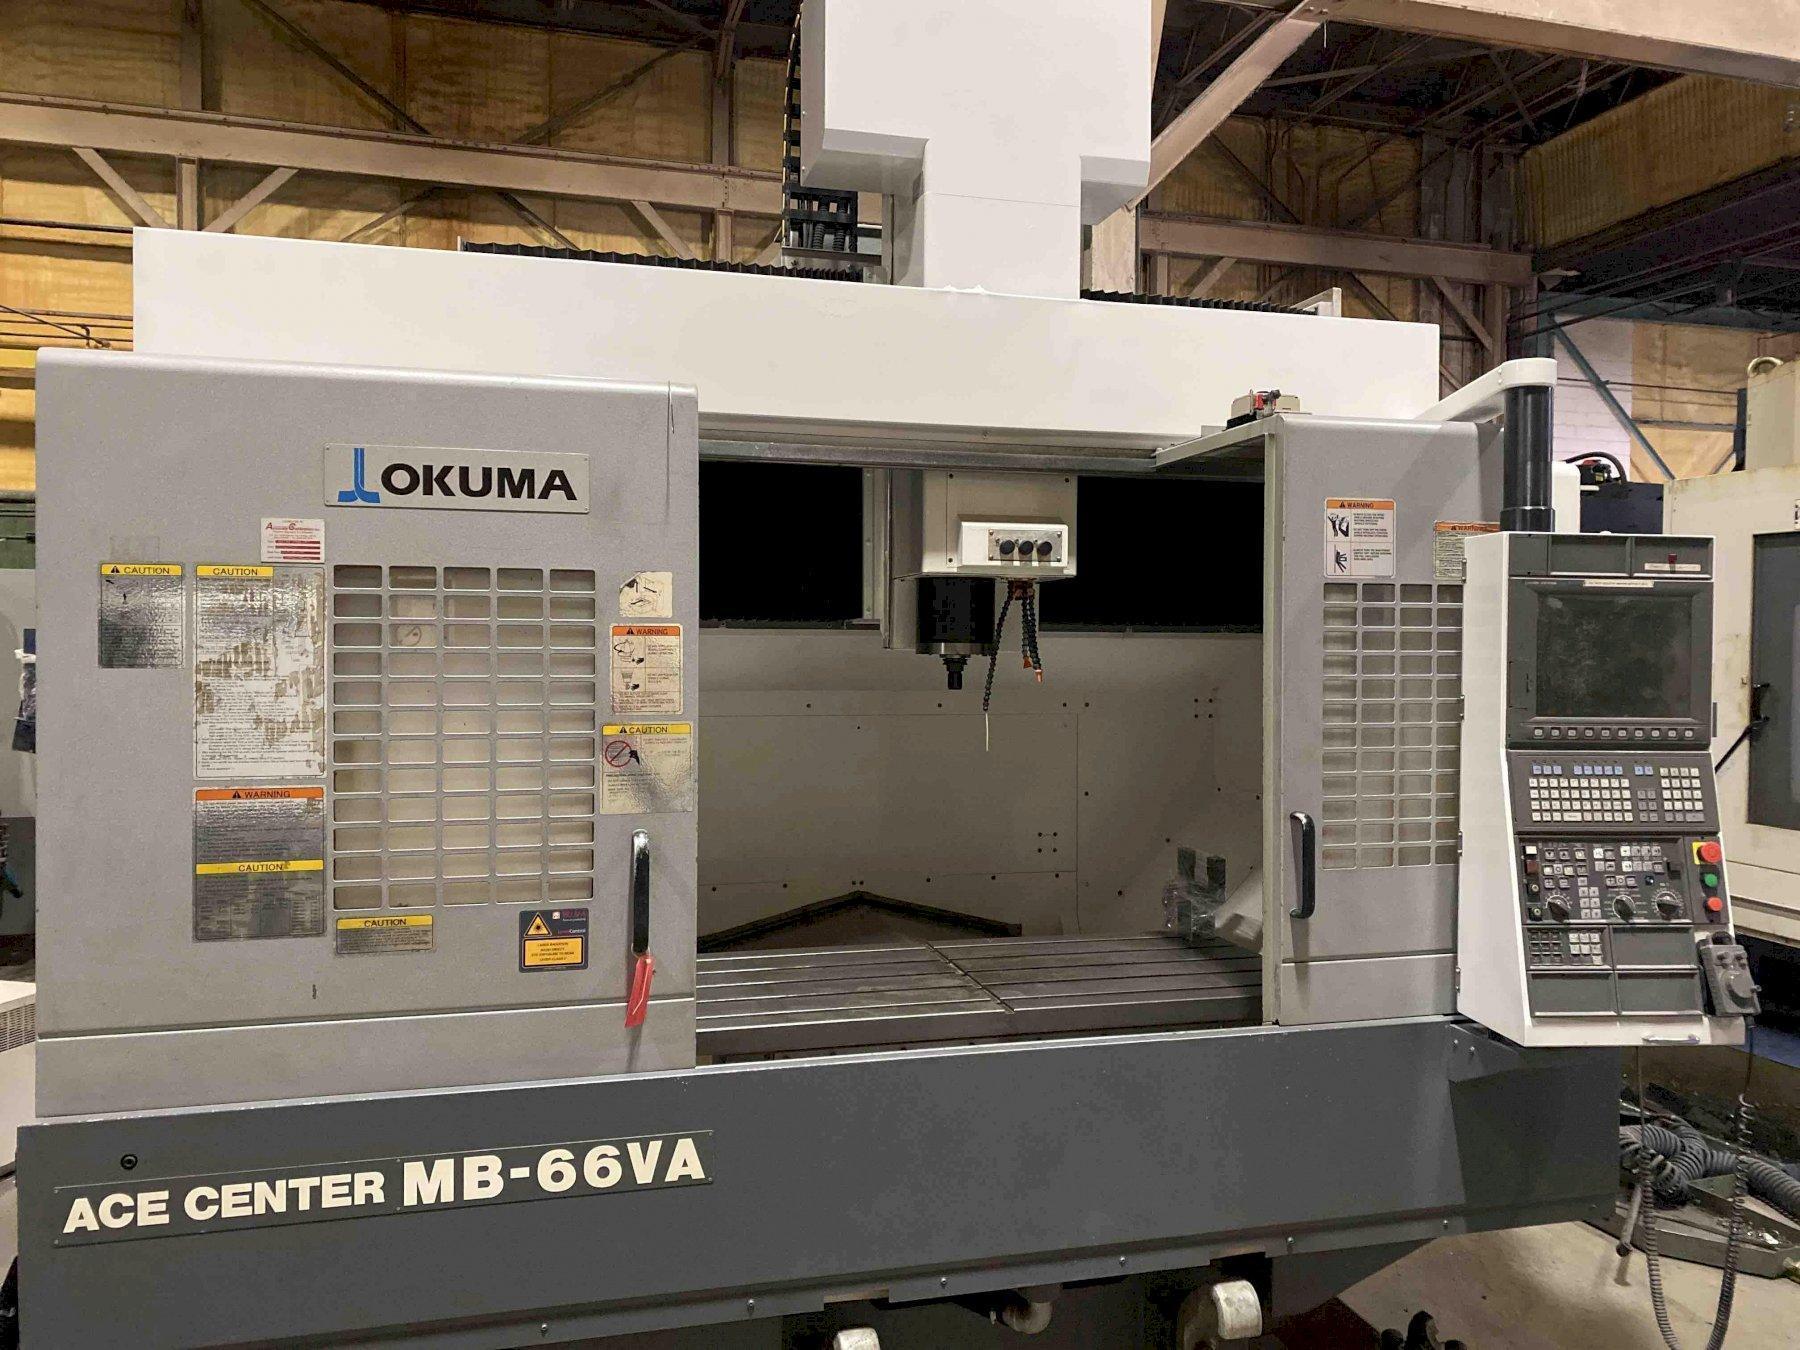 2012 OKUMA MB-66VA CNC Vertical Machining Center